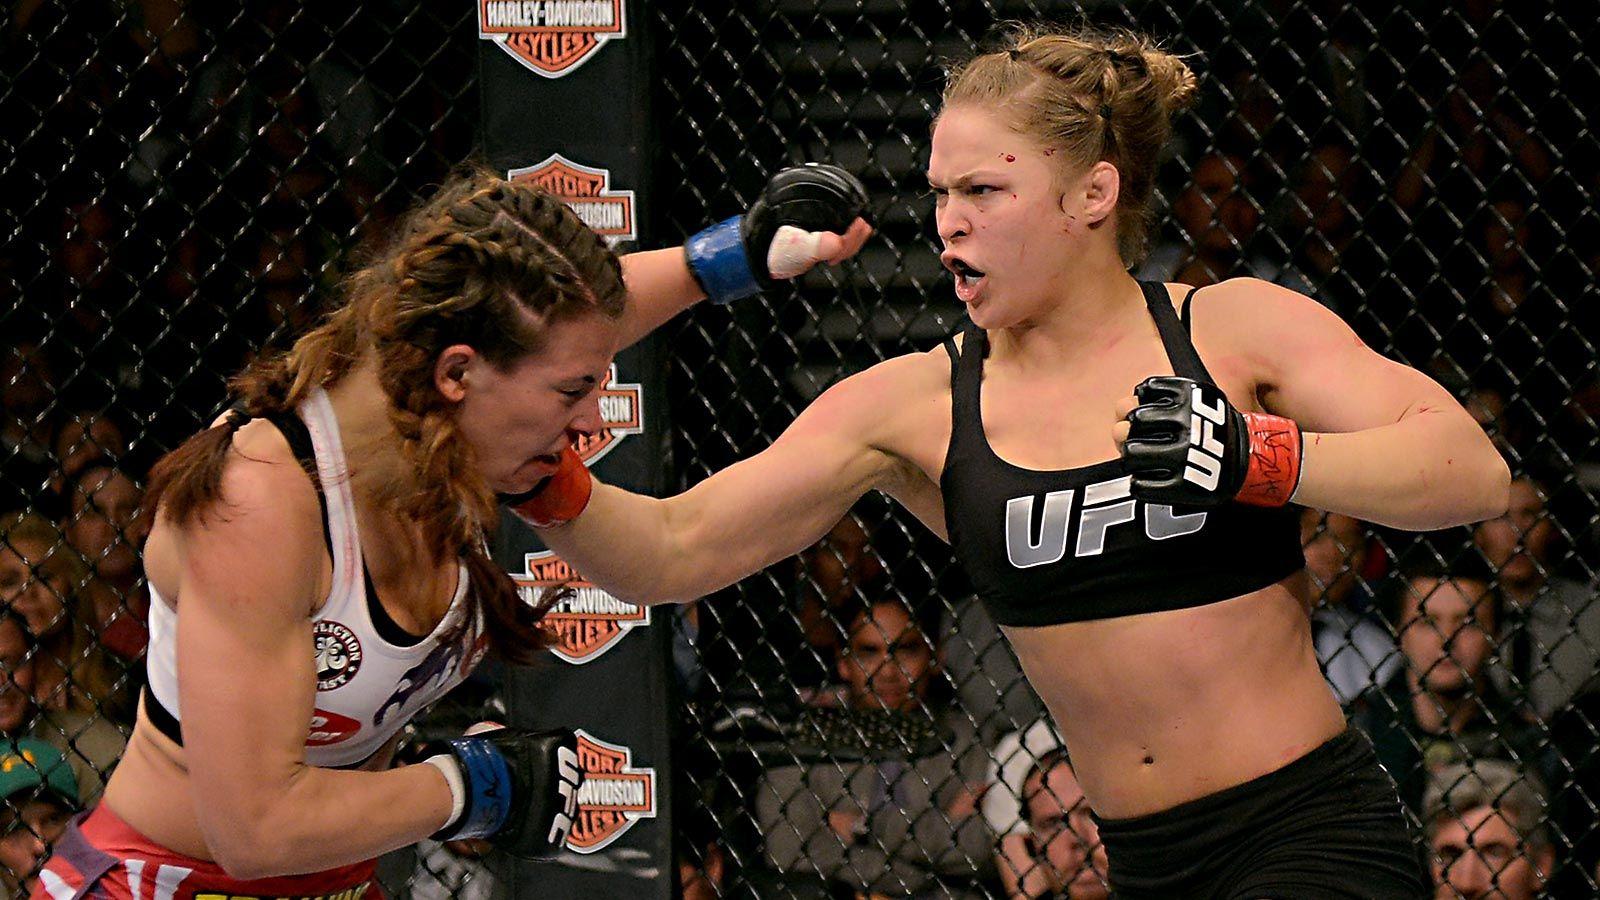 122813 Ufc Ronda Rousey Punches Miesha Tate Ahn Pi Jpg 1600 900 Ronda Rousey Ronda Rousey Ufc Miesha Tate